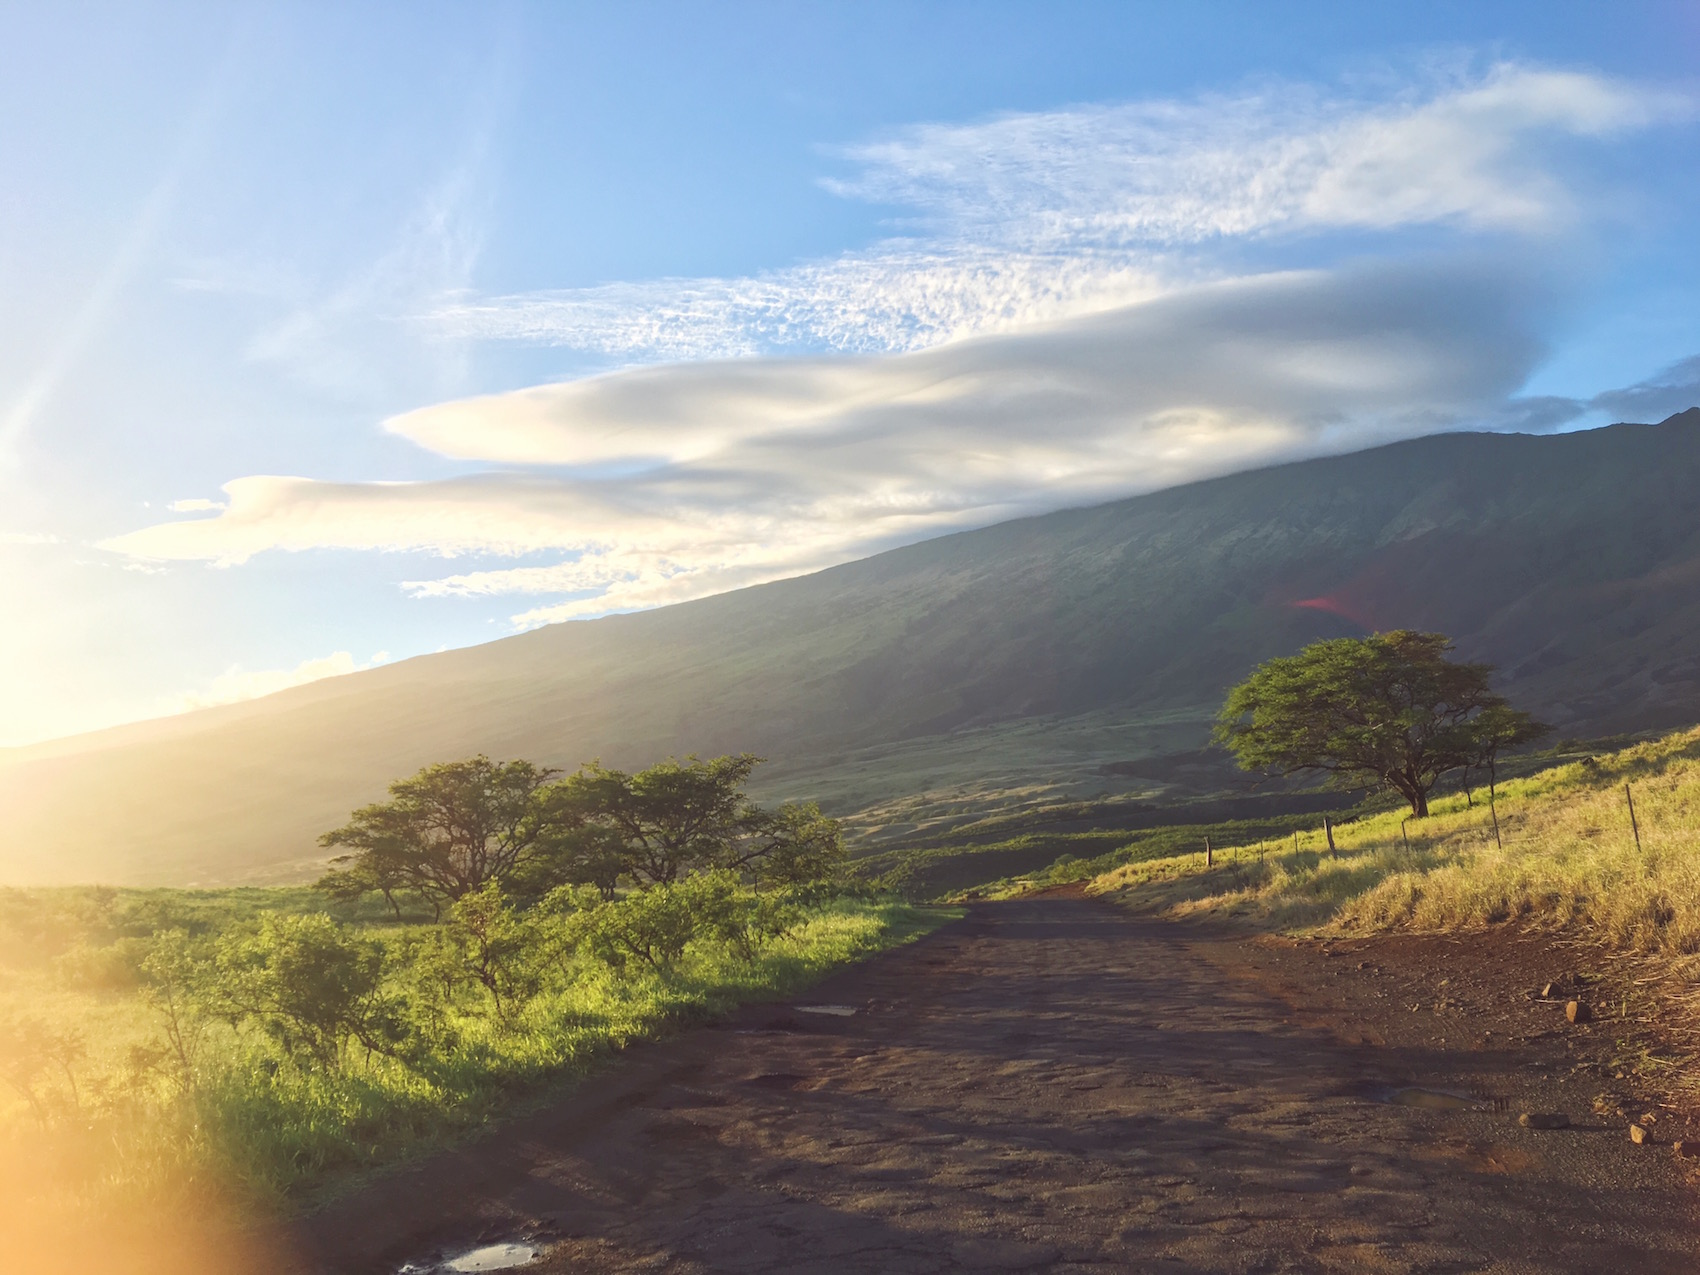 Oltre la Road to hana di Maui - Hawaii.jpg